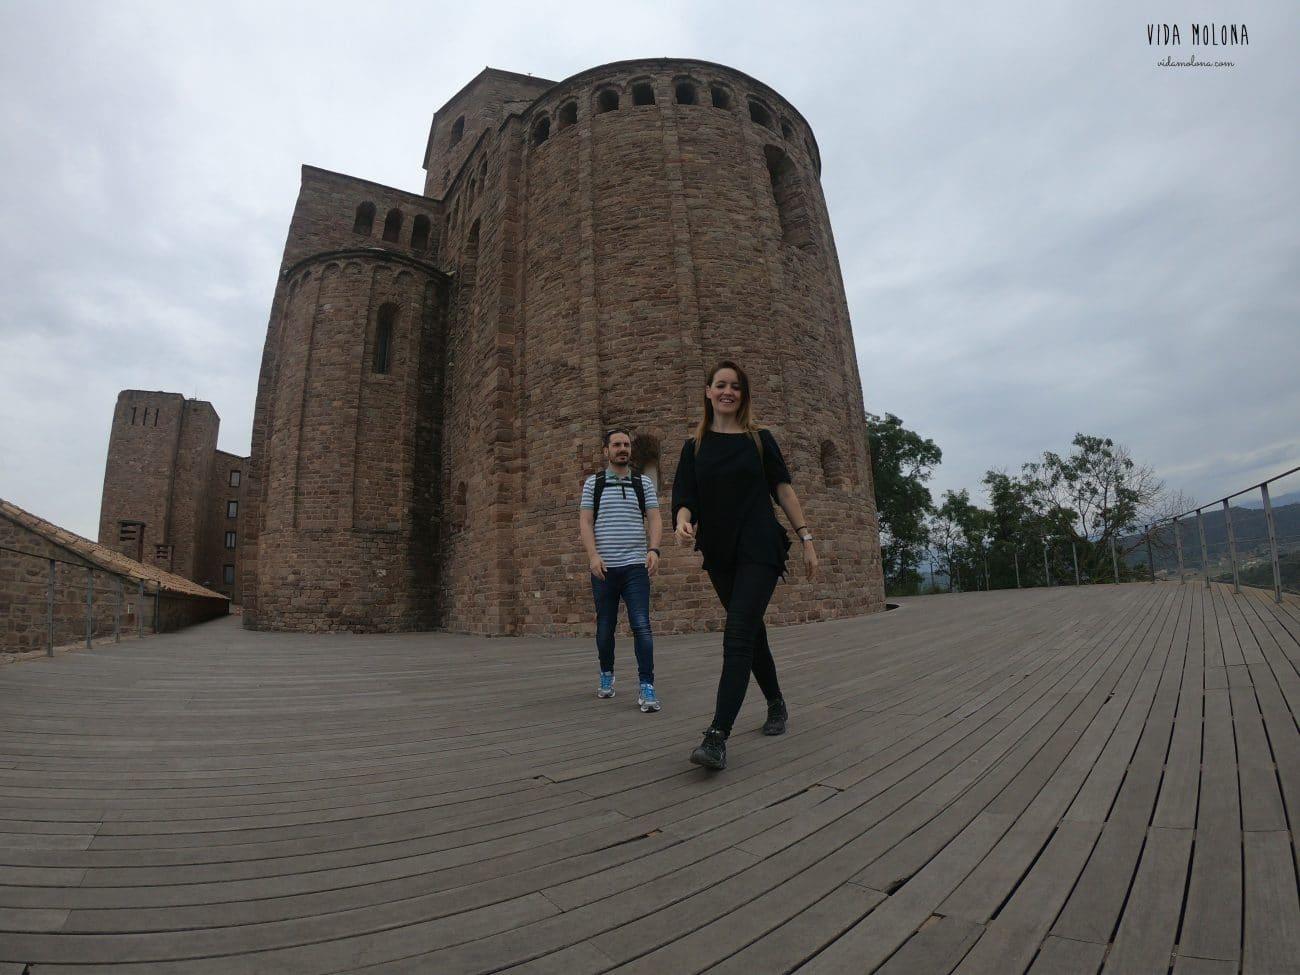 castillo-cardona-visita-historia-4